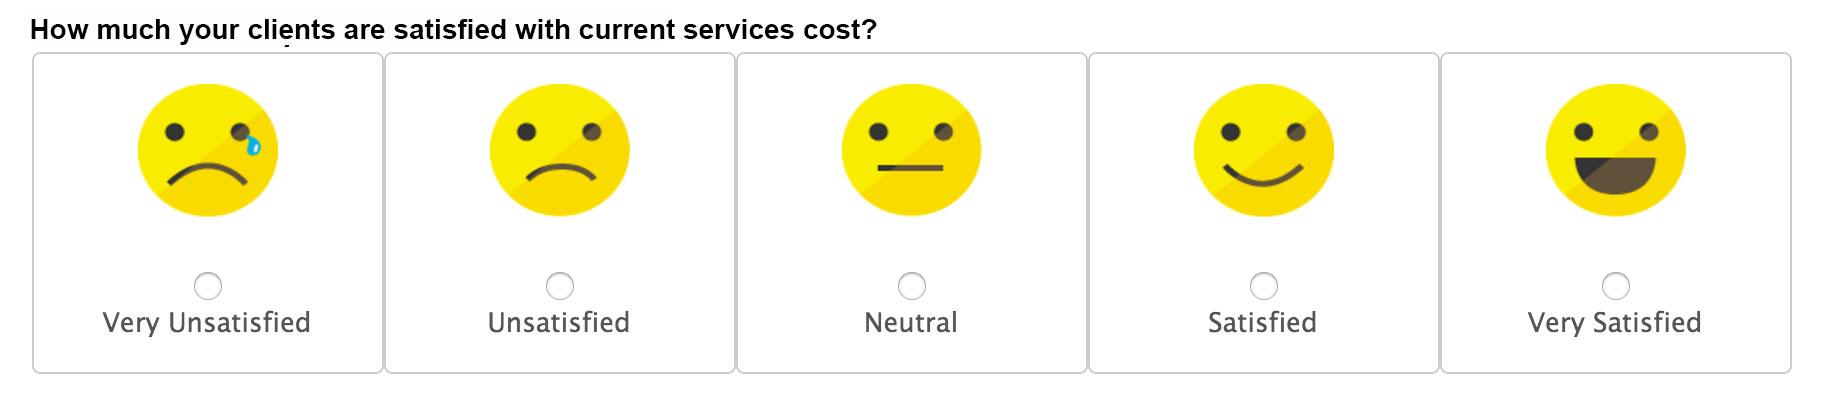 3 proven medical billing pricing models every billing